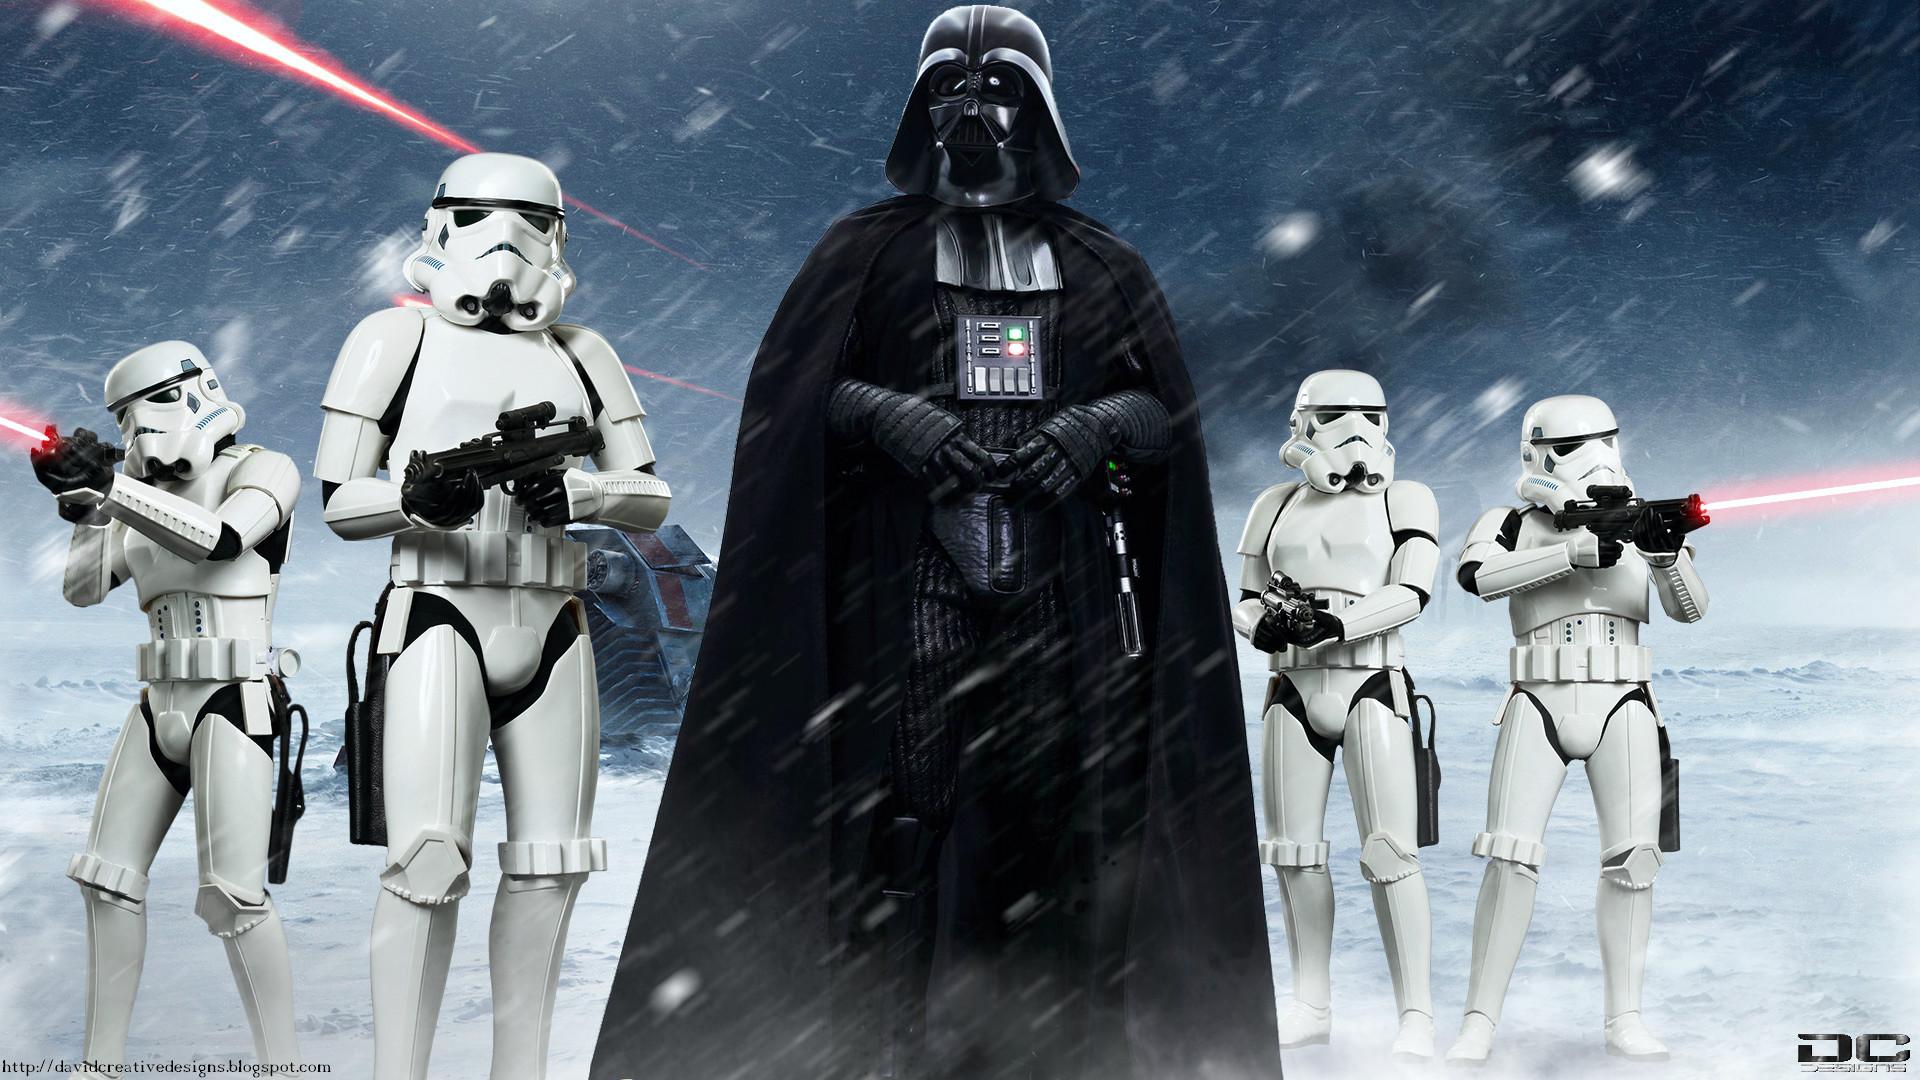 Stormtrooper Star Wars Wallpapers   HD Wallpapers